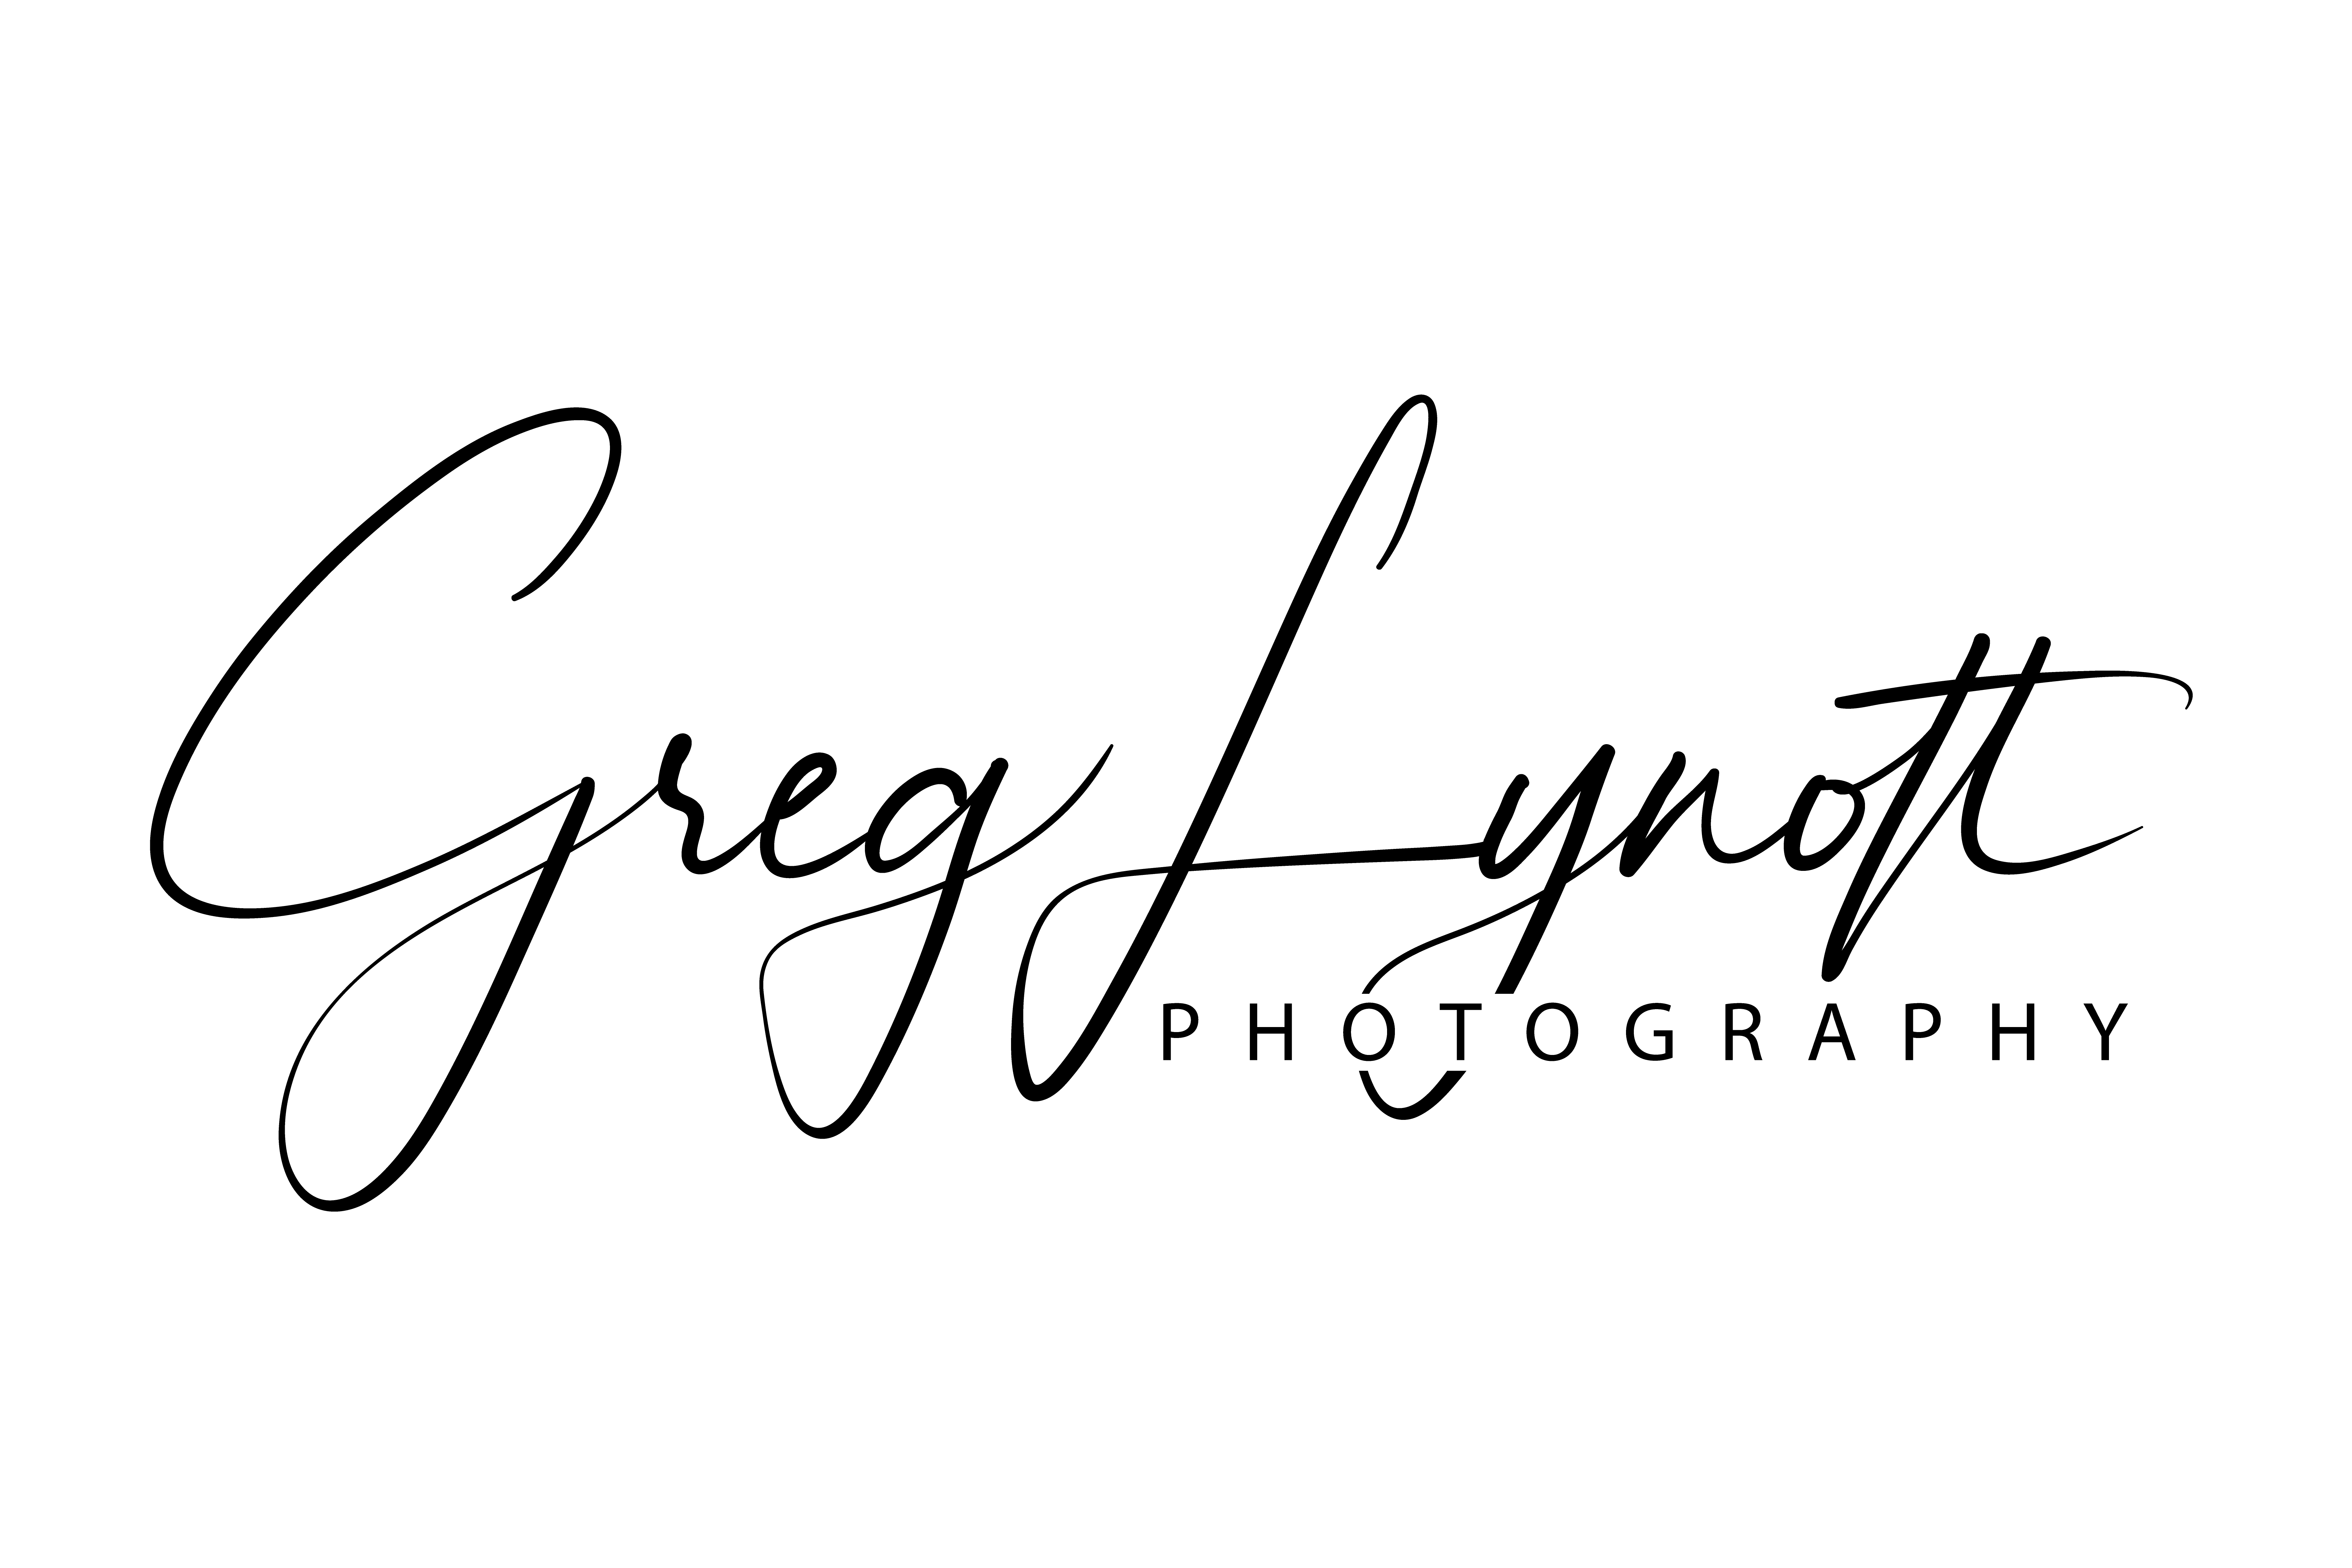 Greg Lynott Real Estate Photography floor plan in Phoenix Los Angeles Riverside San Francisco Santa Clarita Denver Wilmington Washington D.C. Fort Myers Miami Naples Pensacola Sarasota Tampa Atlanta Annapolis Baltimore Bel Air Frederick Boston Springfield Las Vegas Cherry Hill Trenton Middletown Raleigh Cleveland Portland Chambersburg Gettysburg Harrisburg Philadelphia Pittsburgh Reading Scranton State College Wilkes-Barre York Austin Dallas Houston San Antonio Fairfax Richmond Yakima